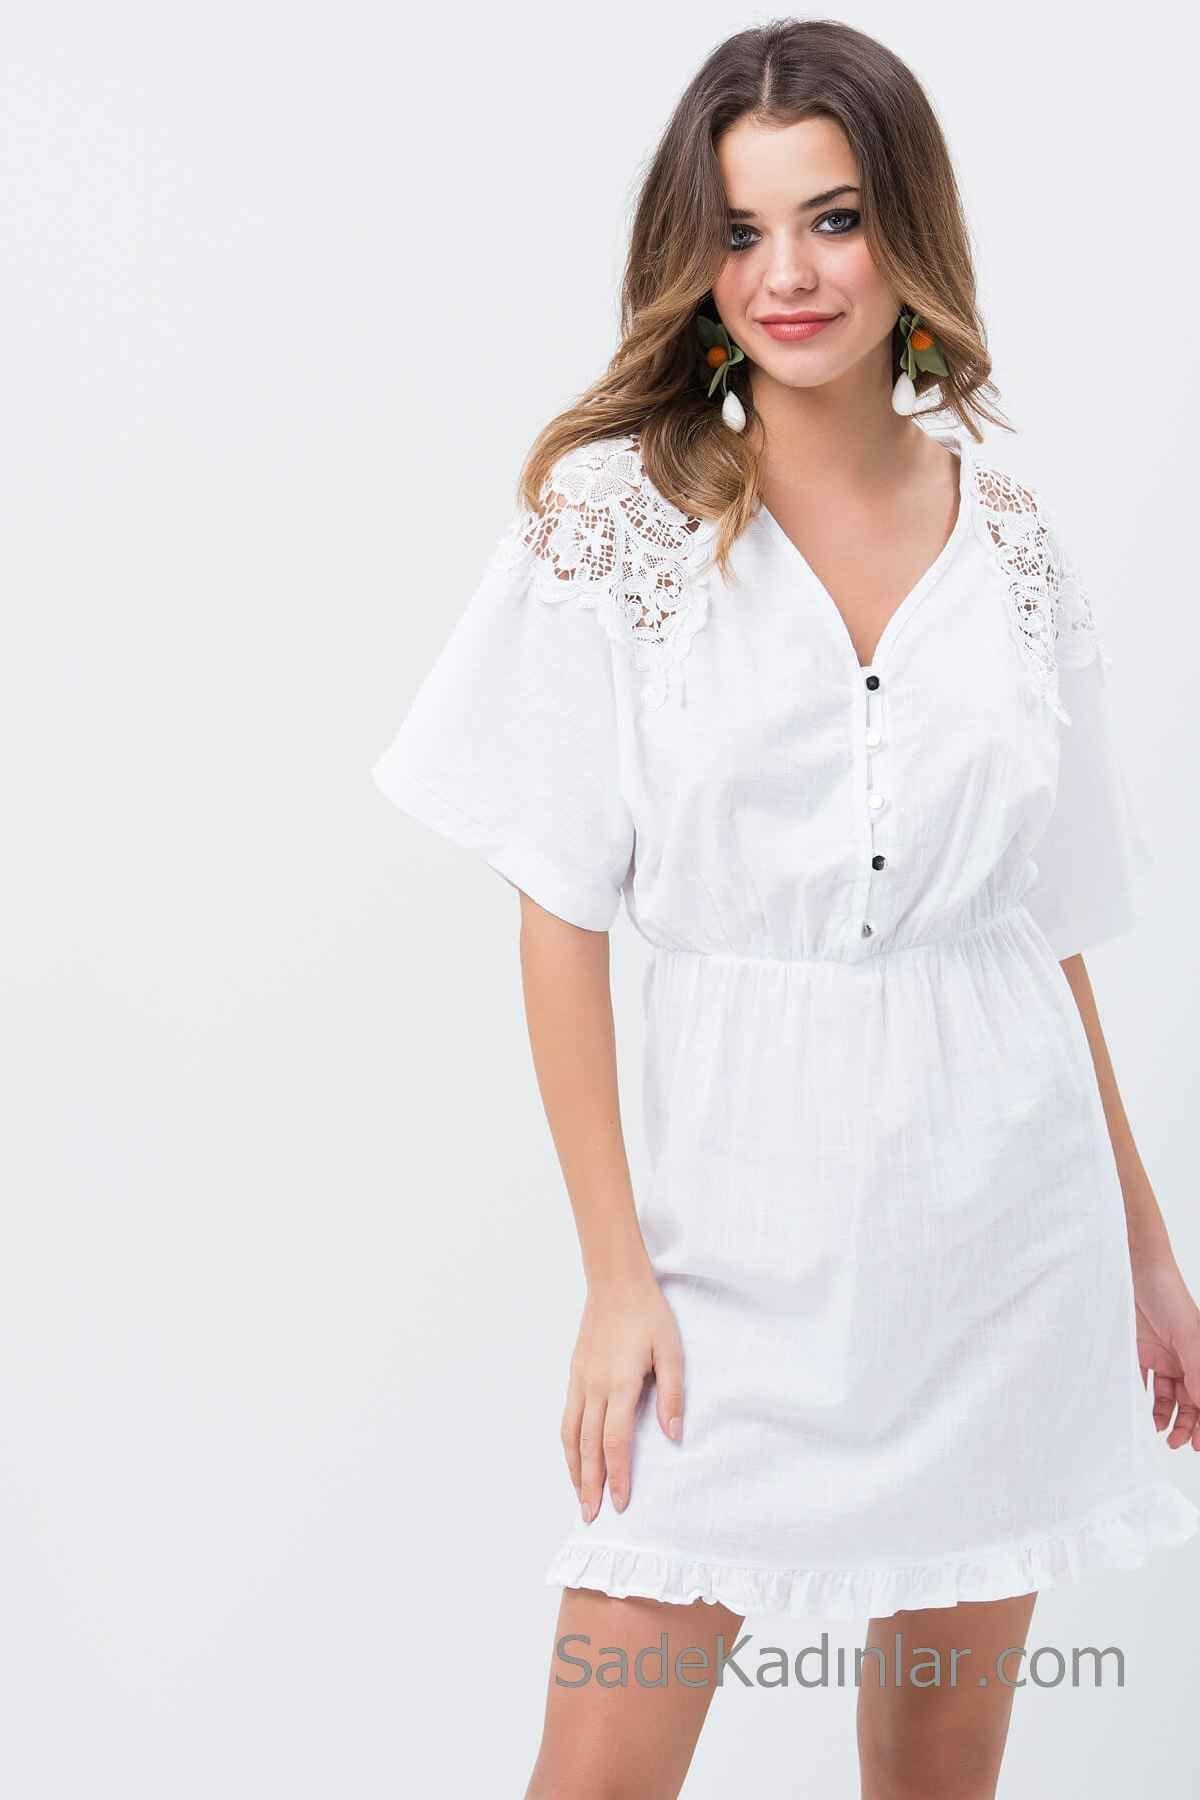 2019 Gunluk Keten Elbise Modelleri Beyaz Kisa V Yakali Kisa Kol Dantel Detayli 2020 Elbise Modelleri Elbise Tarz Elbiseler